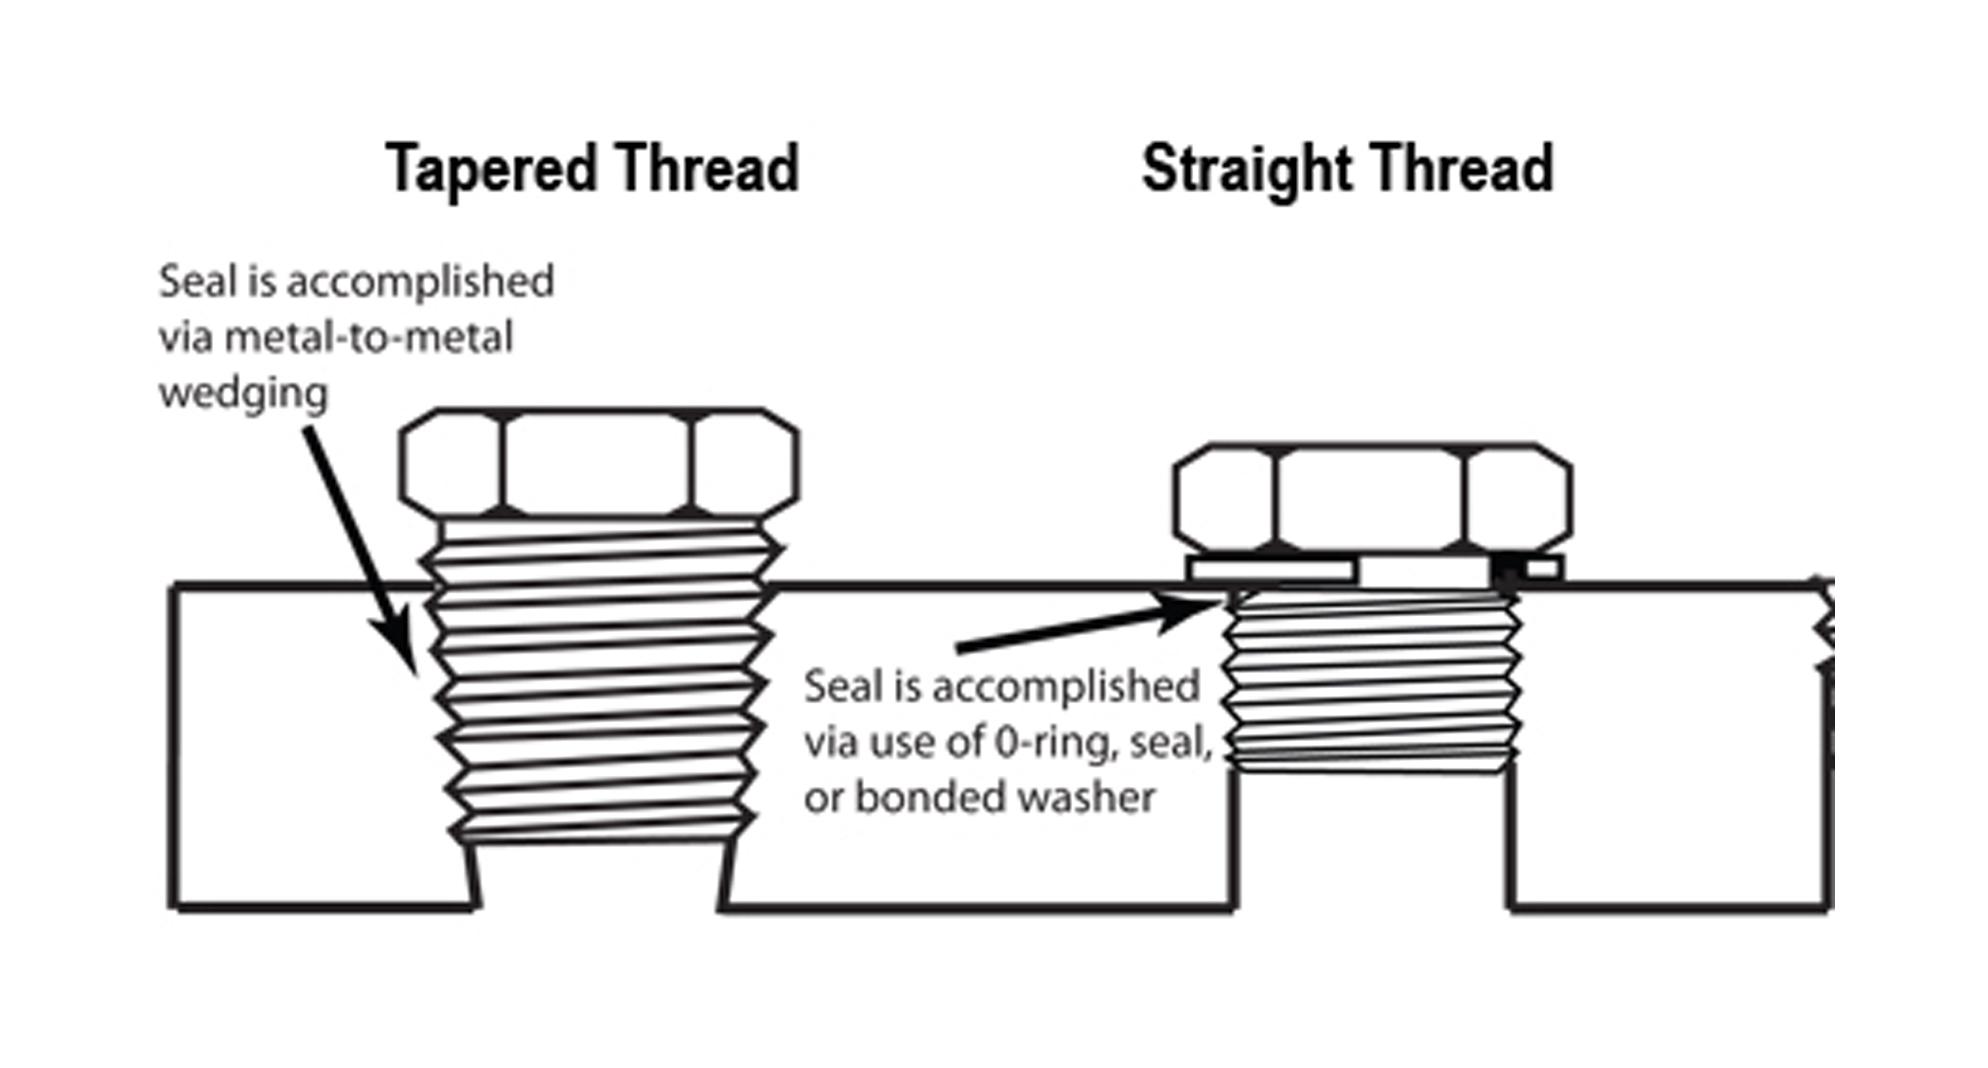 straight-thread-versus-tapered-thread-jpg